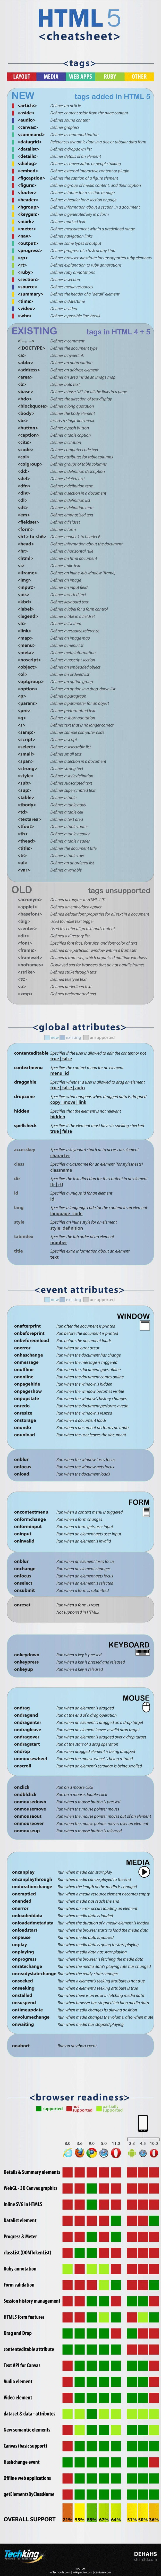 Infographic: HTML5 Cheatsheat